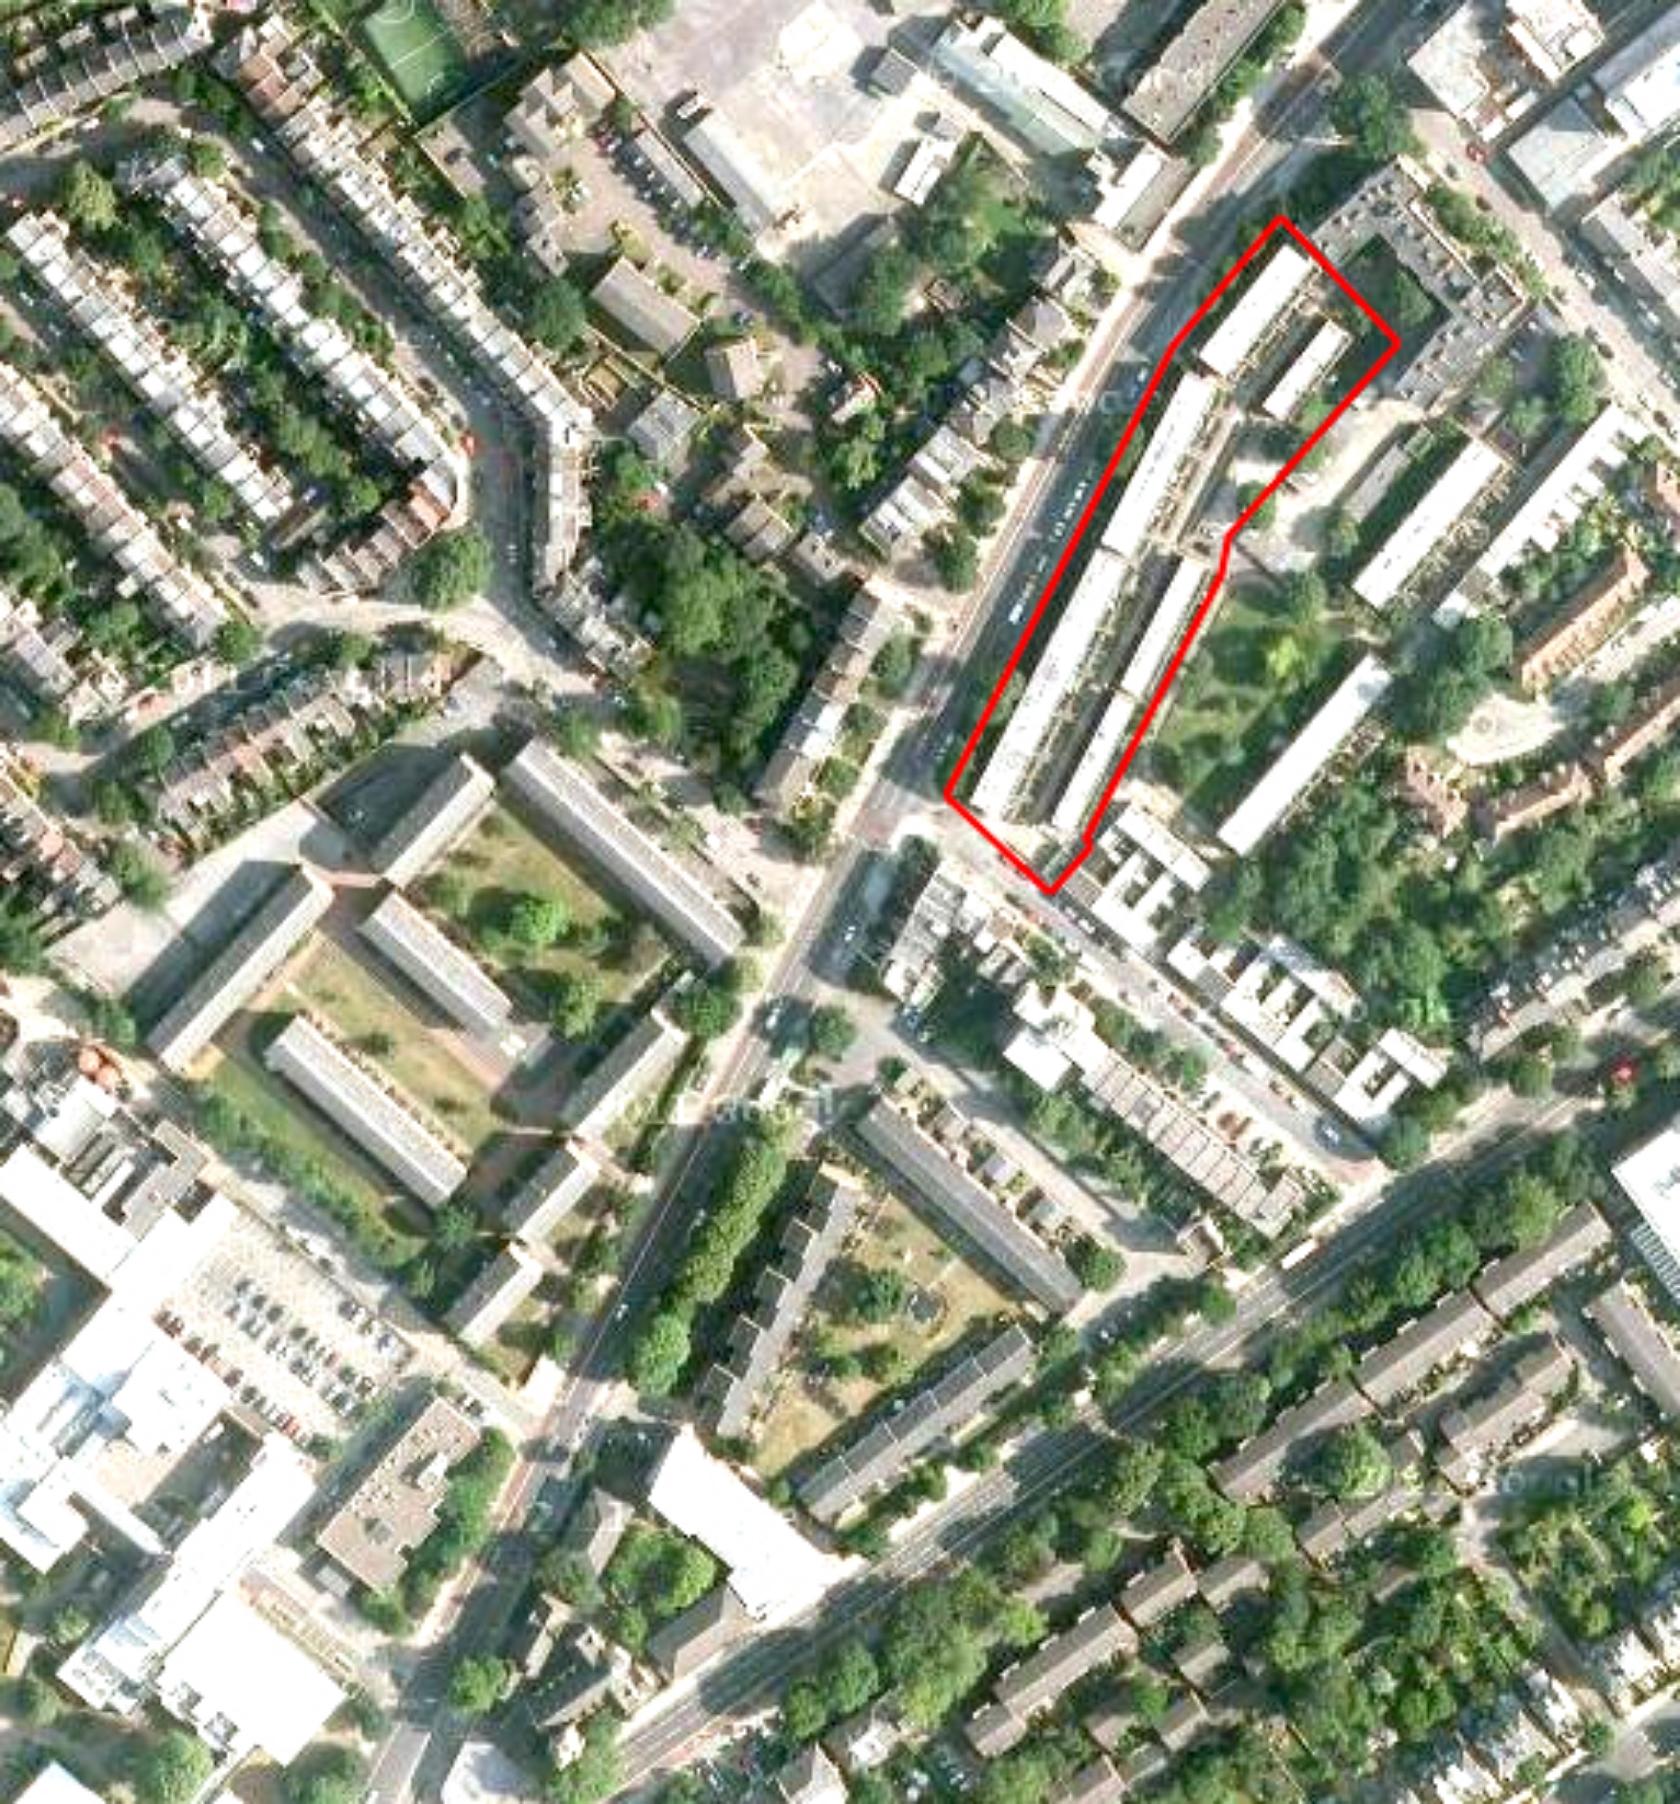 Site location - Parkhurst Road, Islington